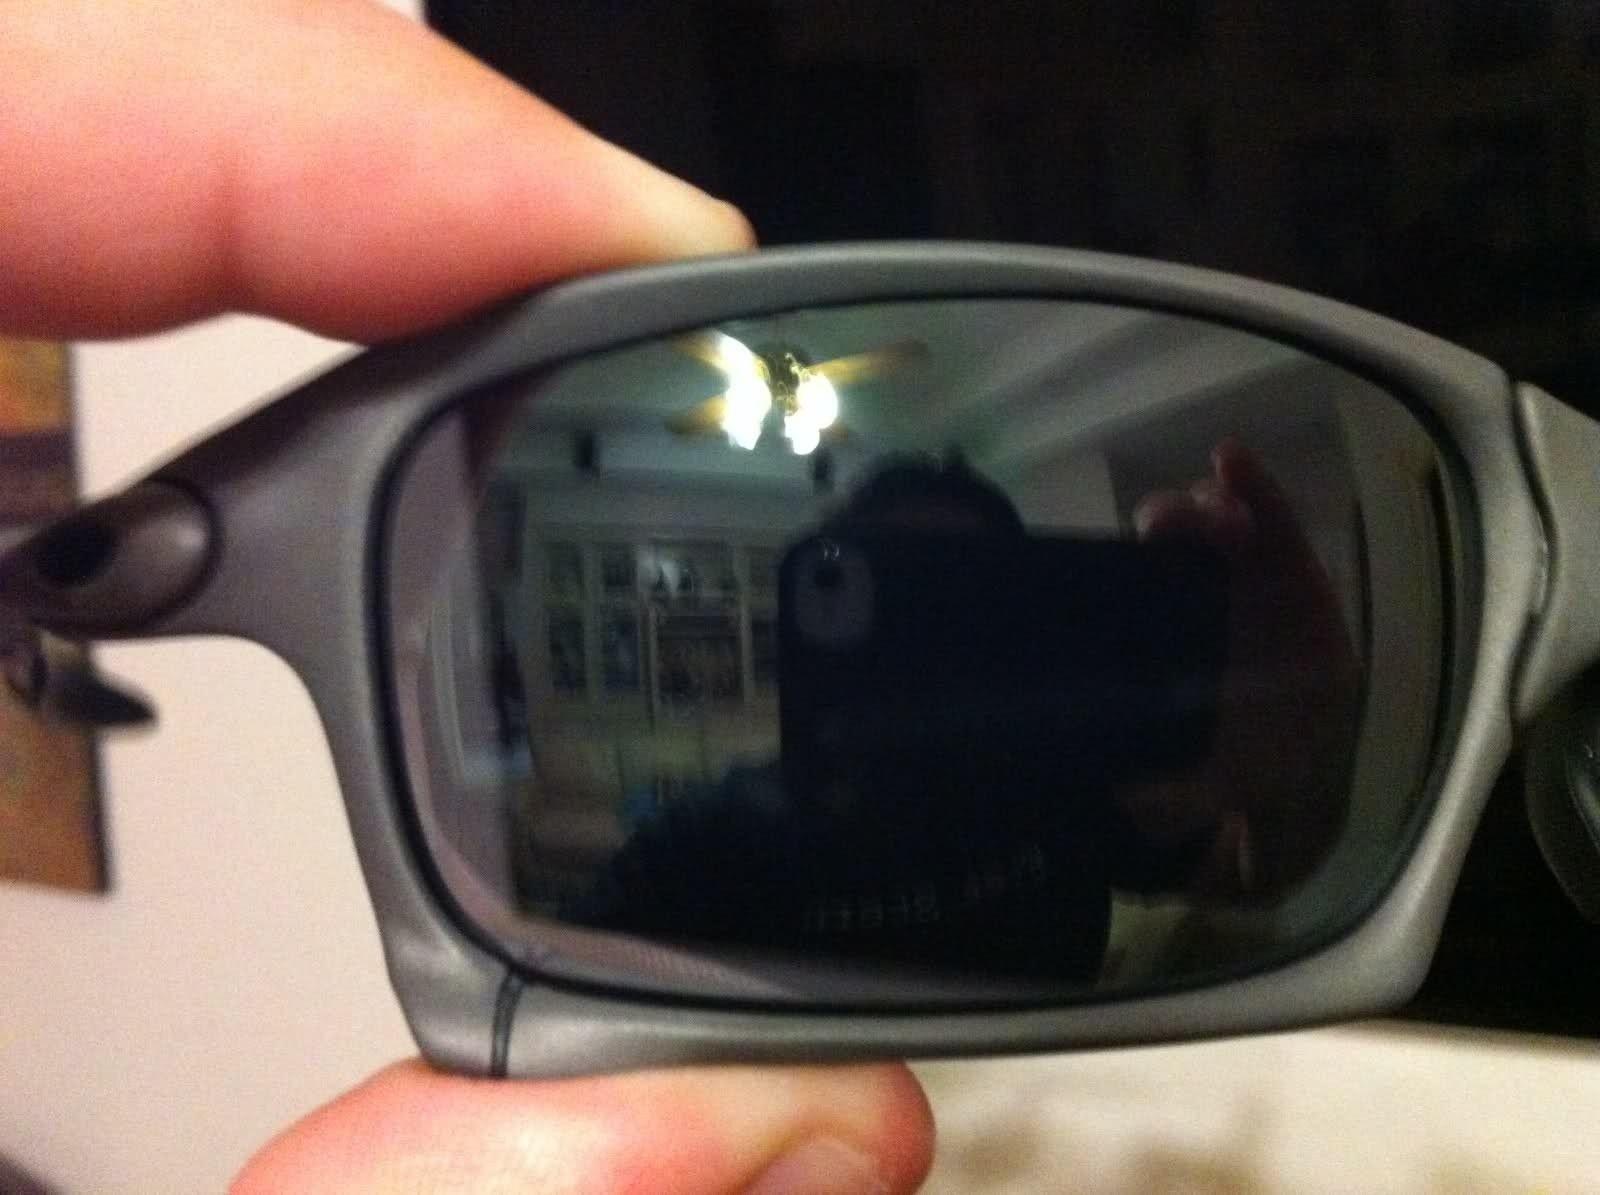 *TRADED* X-Squared With Extra Lenses LNIB - 17g0ep.jpg